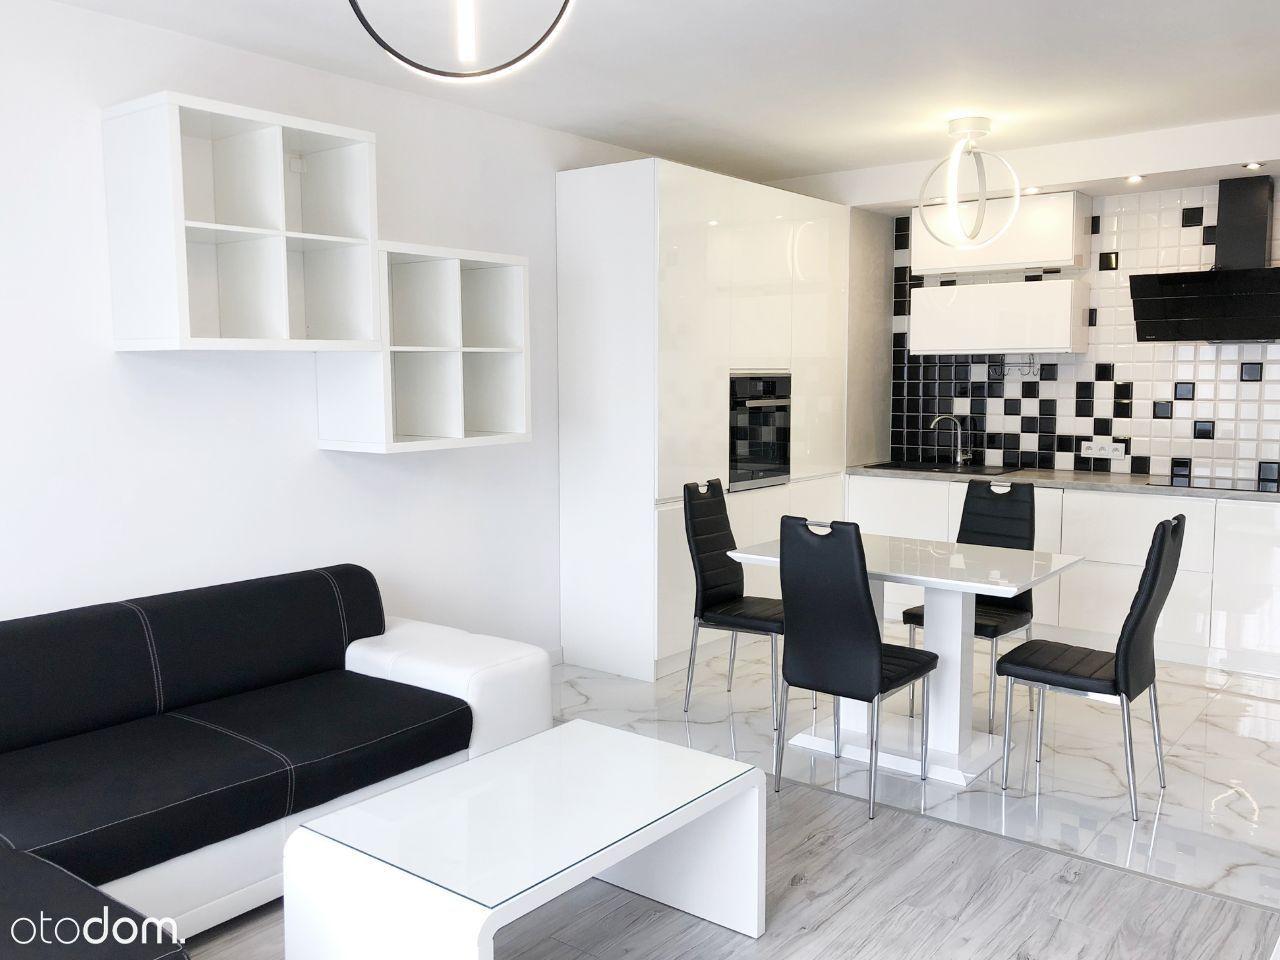 Luksusowy Apartament przy ul.Rydlówka|ENG